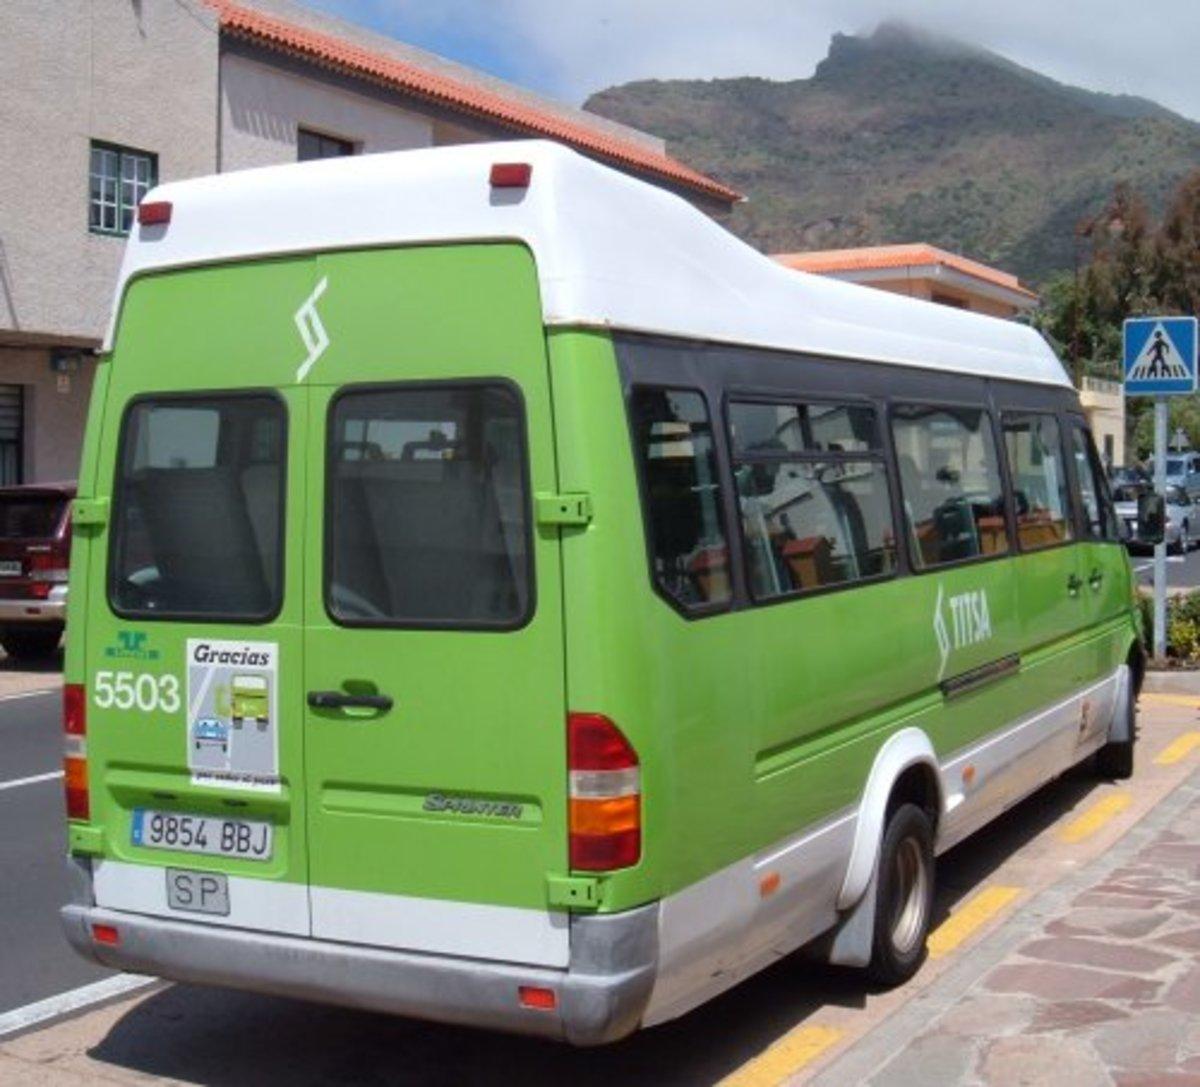 Masca bus Photo by Steve Andrews